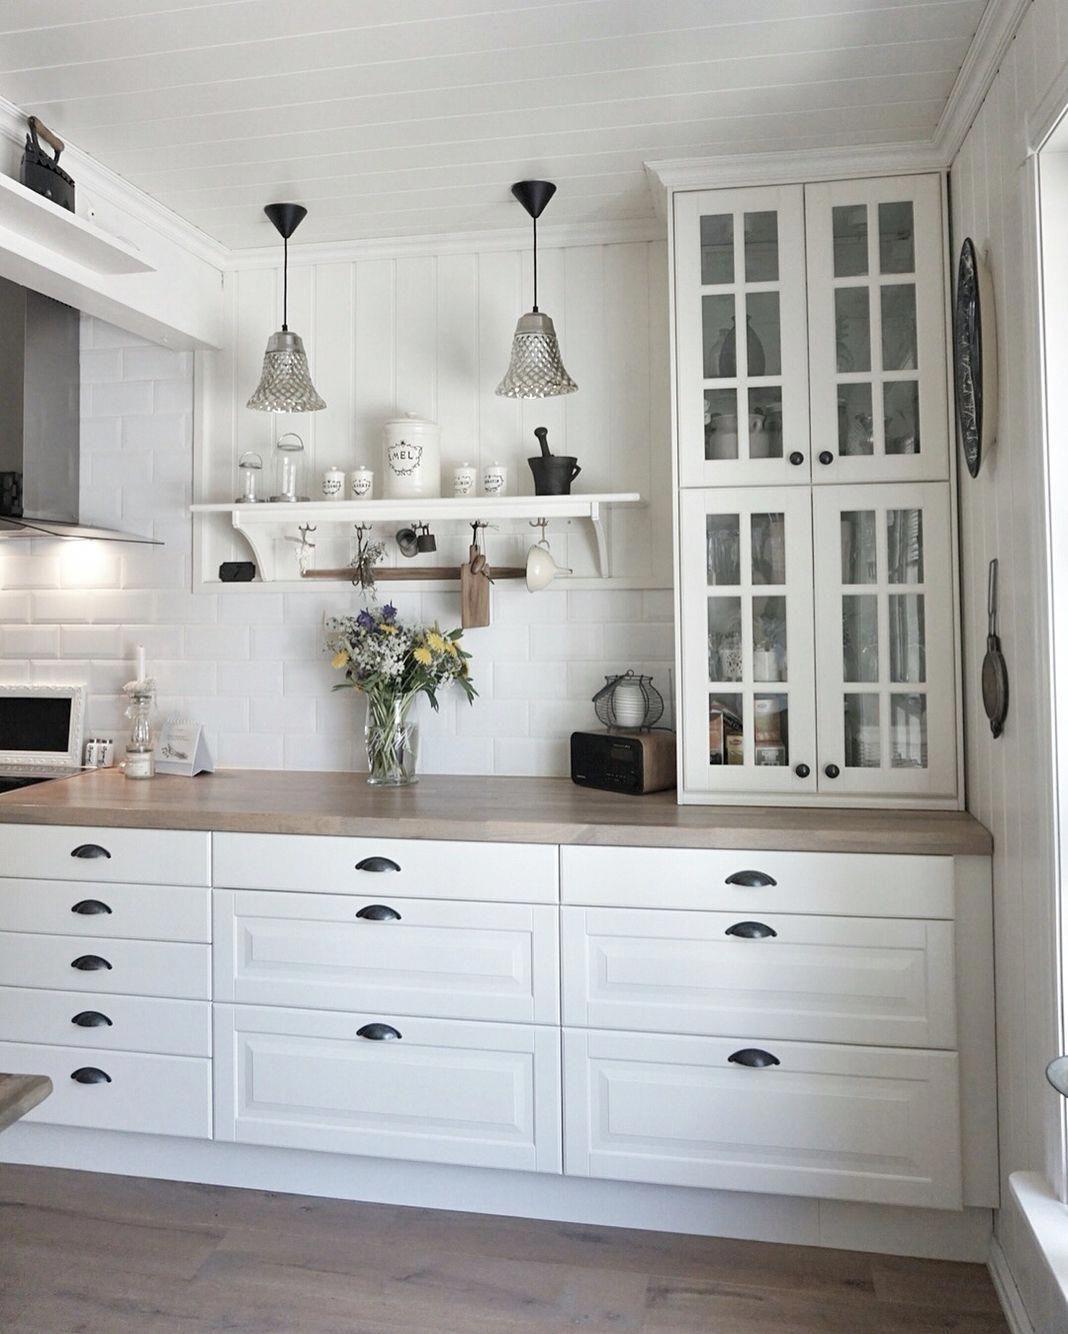 Vitrine Hangeschranke Stapeln Ikea Kitchen Behindabluedoor